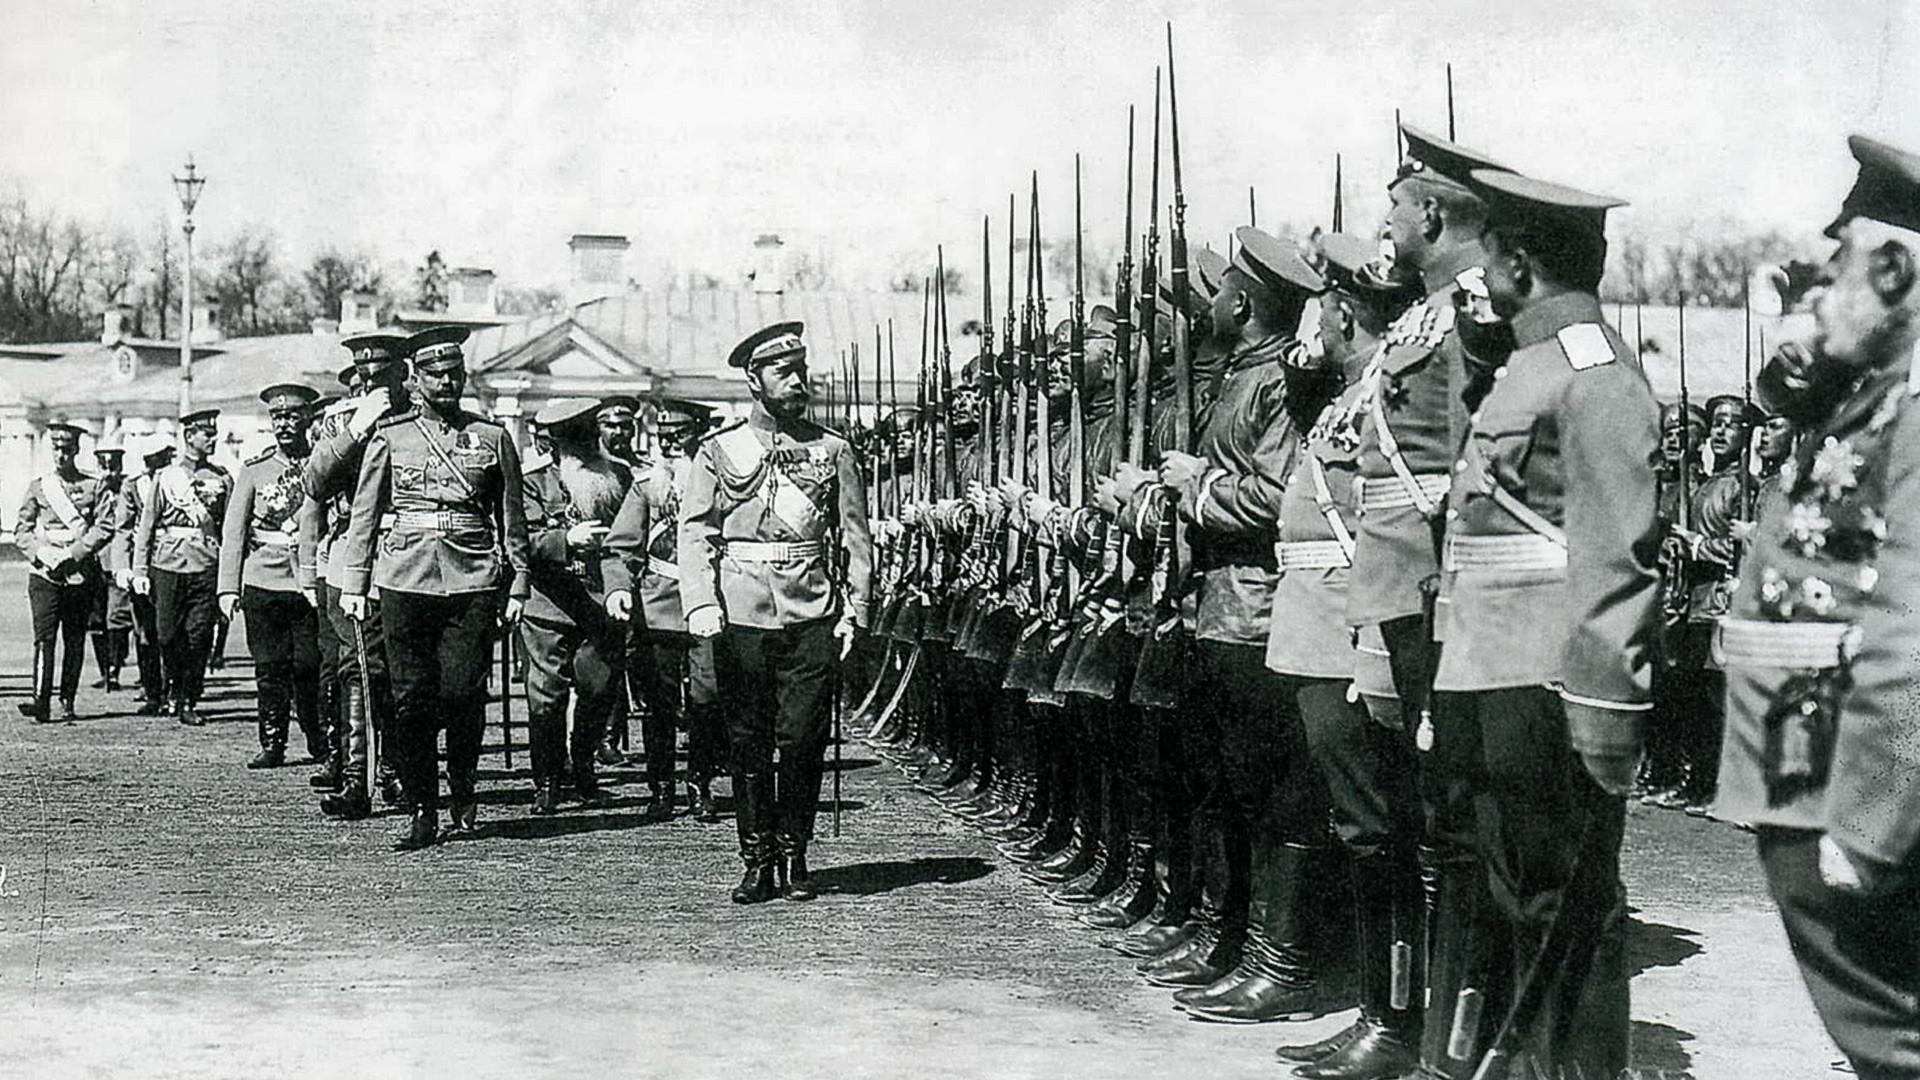 Николай II обходит строй солдат Измайловского полка.